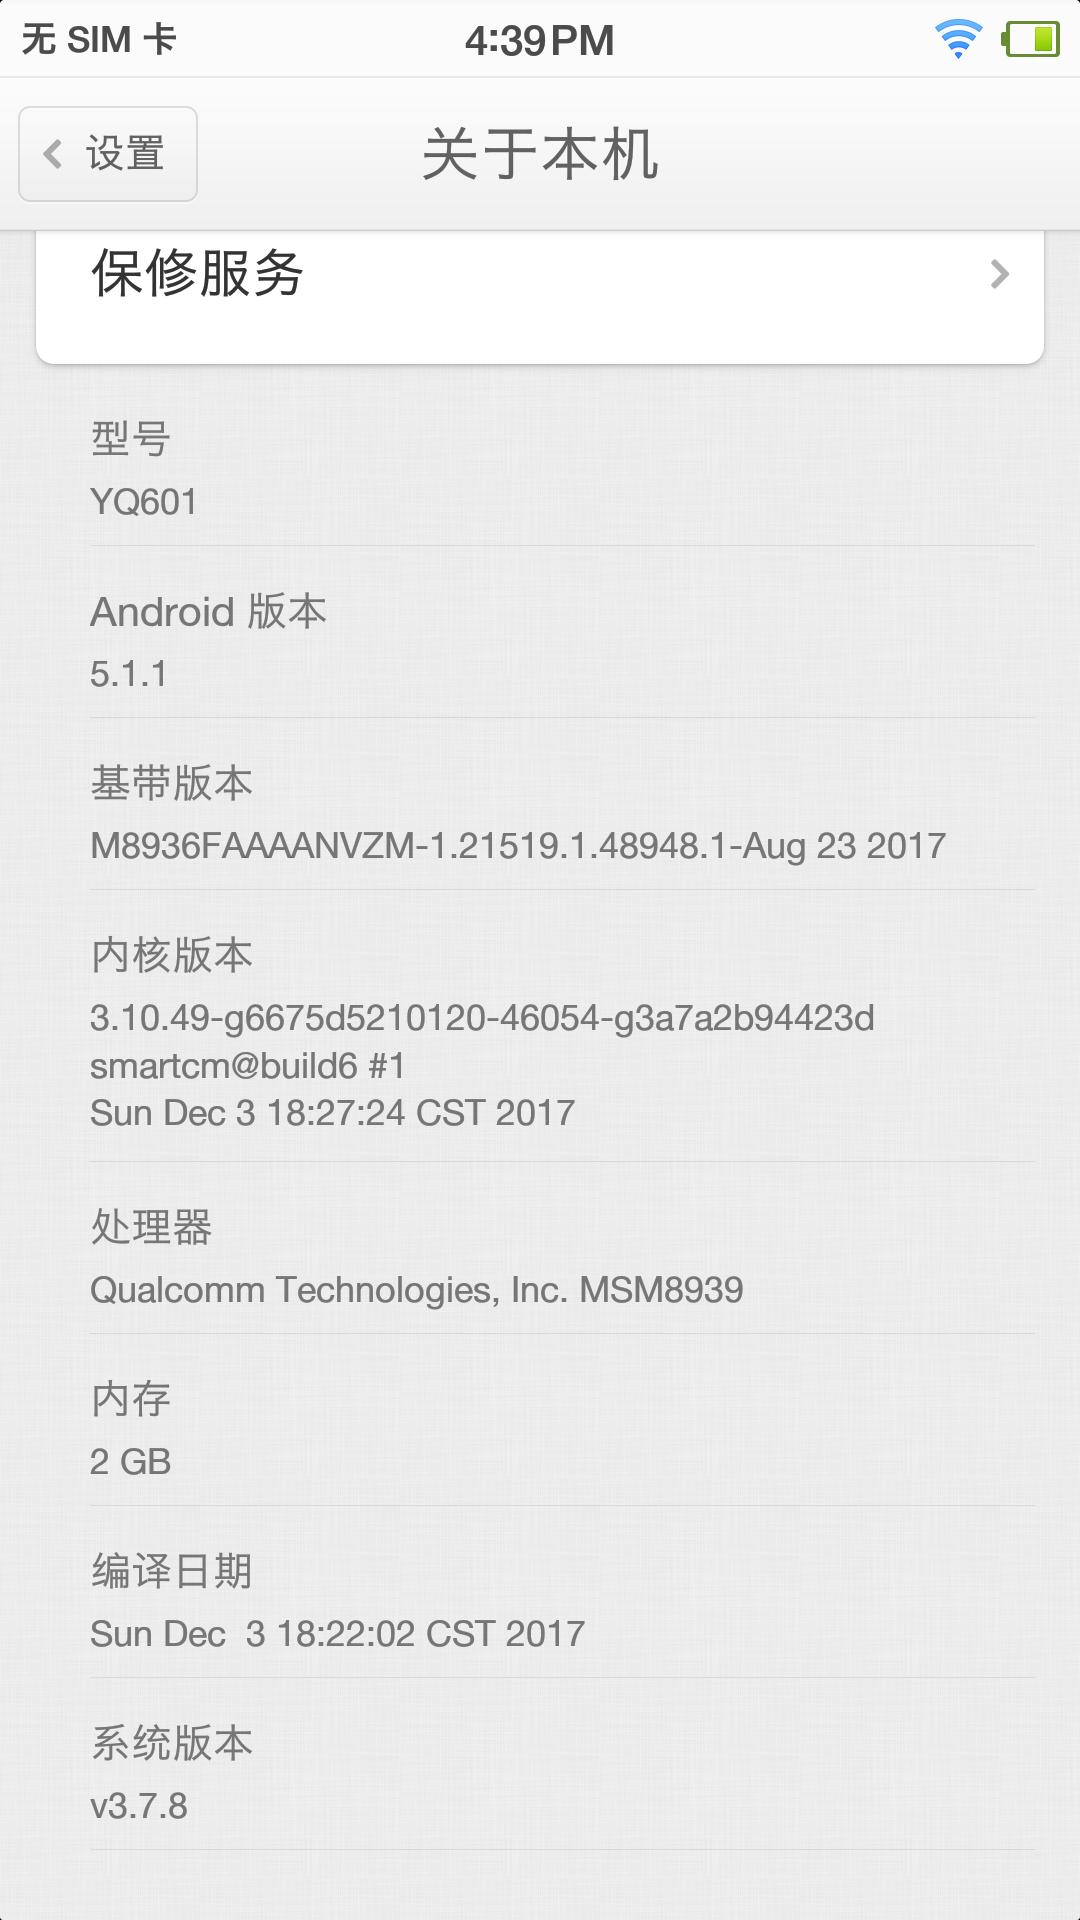 Screenshot_2018-01-06-16-39-56-520_设置[1].png